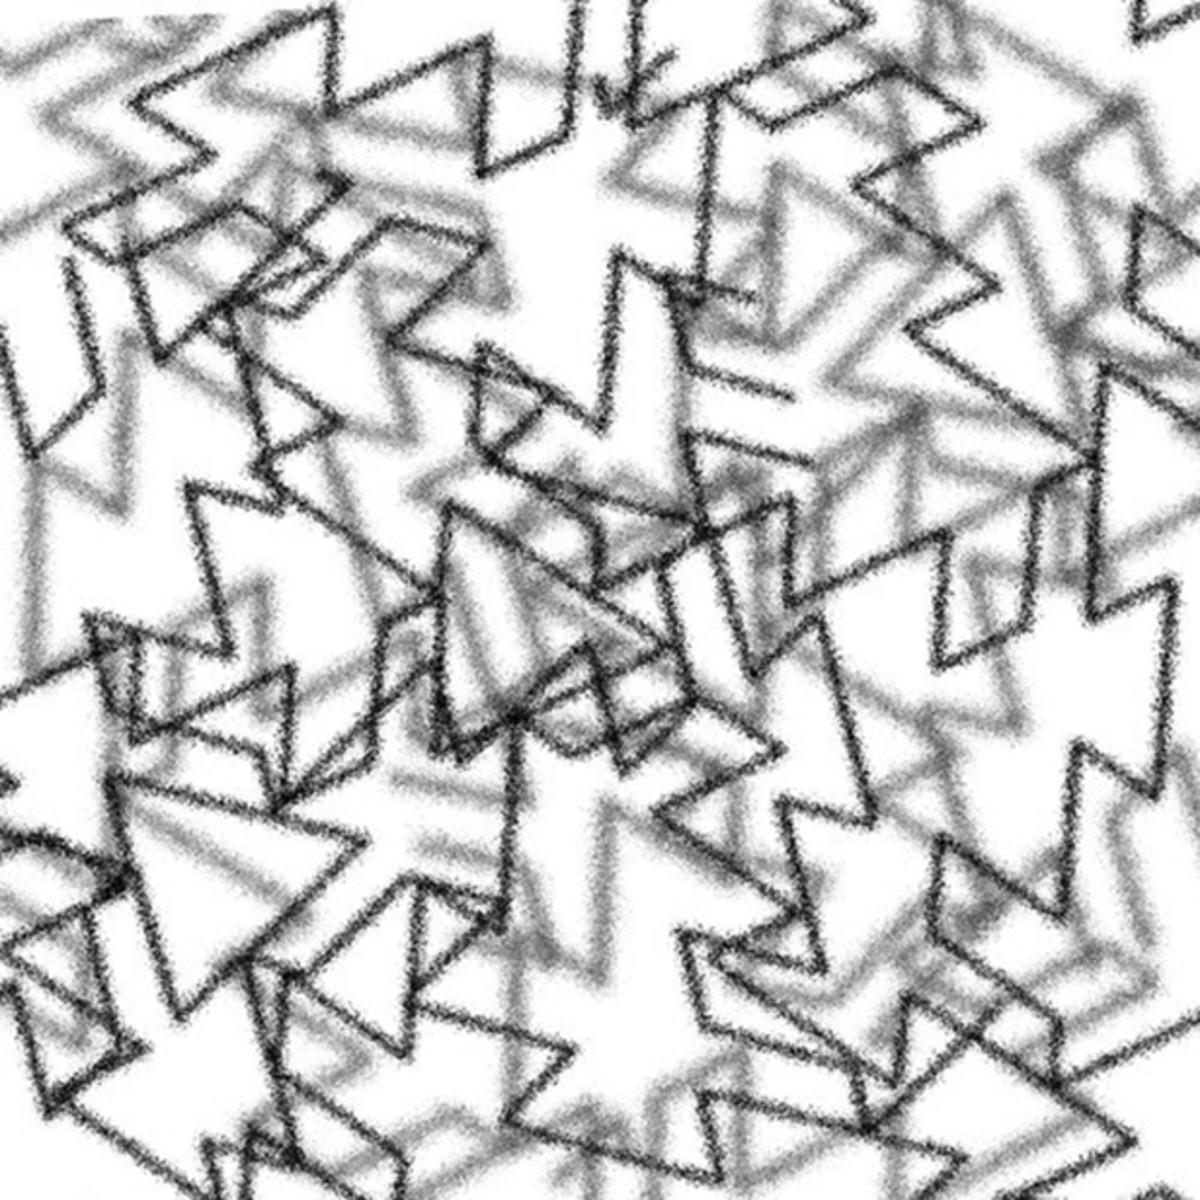 artworks-000075469282-08fqsp-t500x500